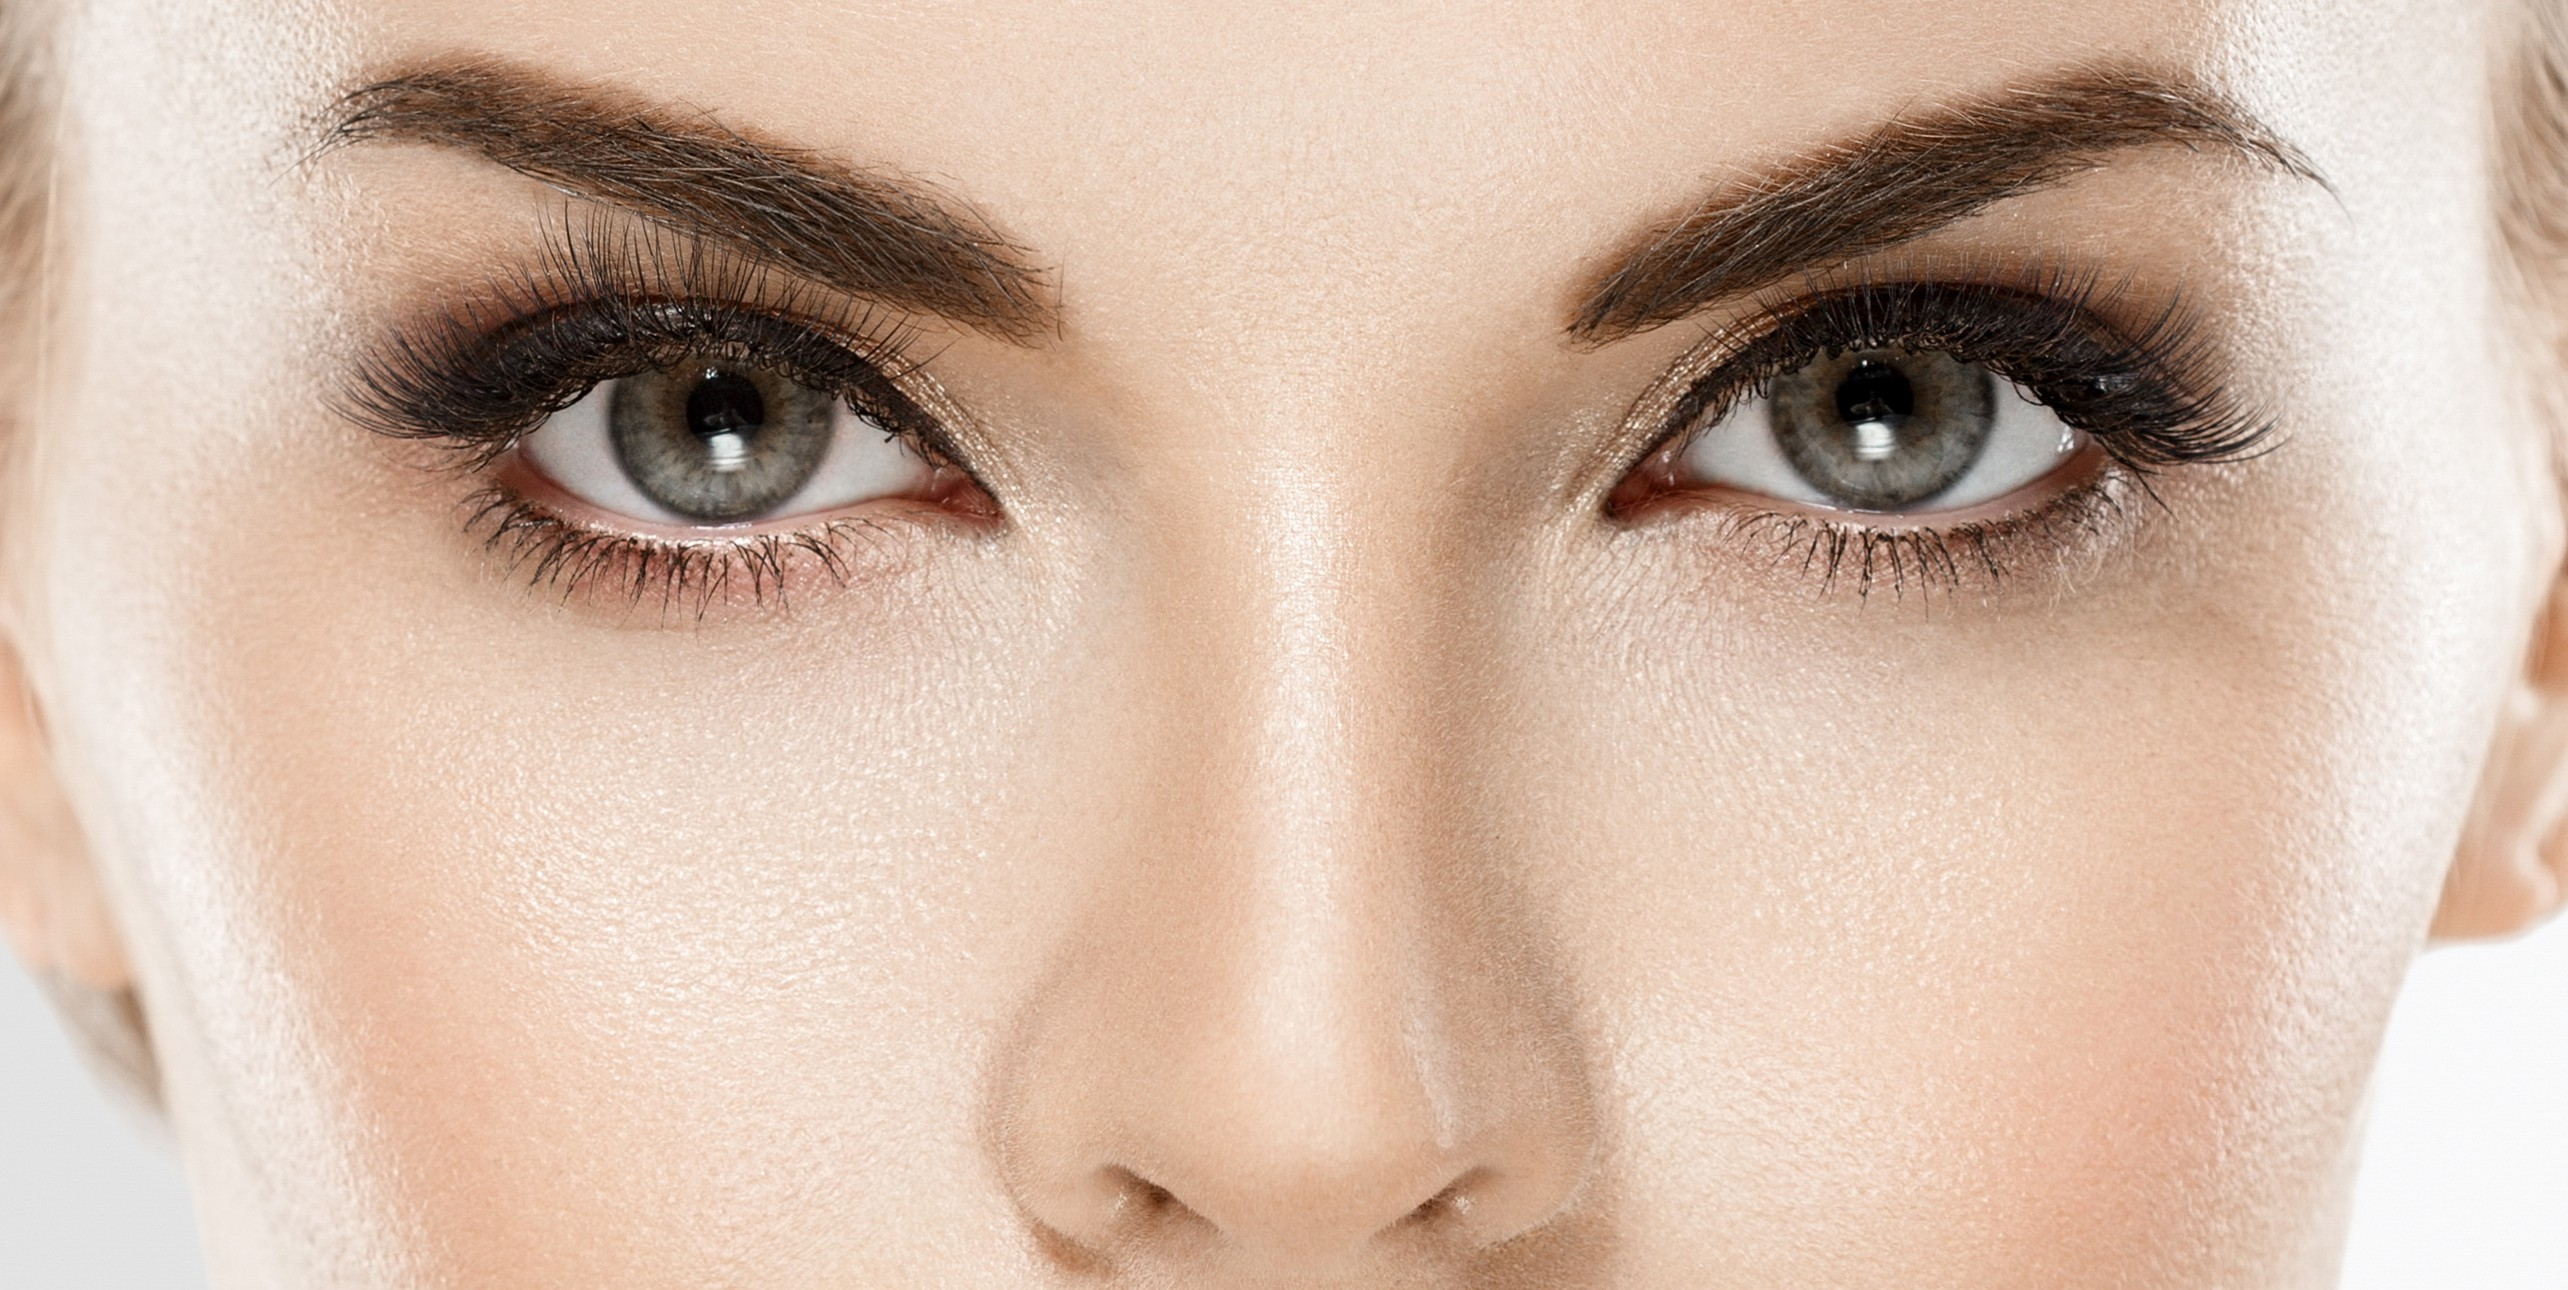 Latisse® Eyelash Serum: 5 Facts About This Lash Treatment